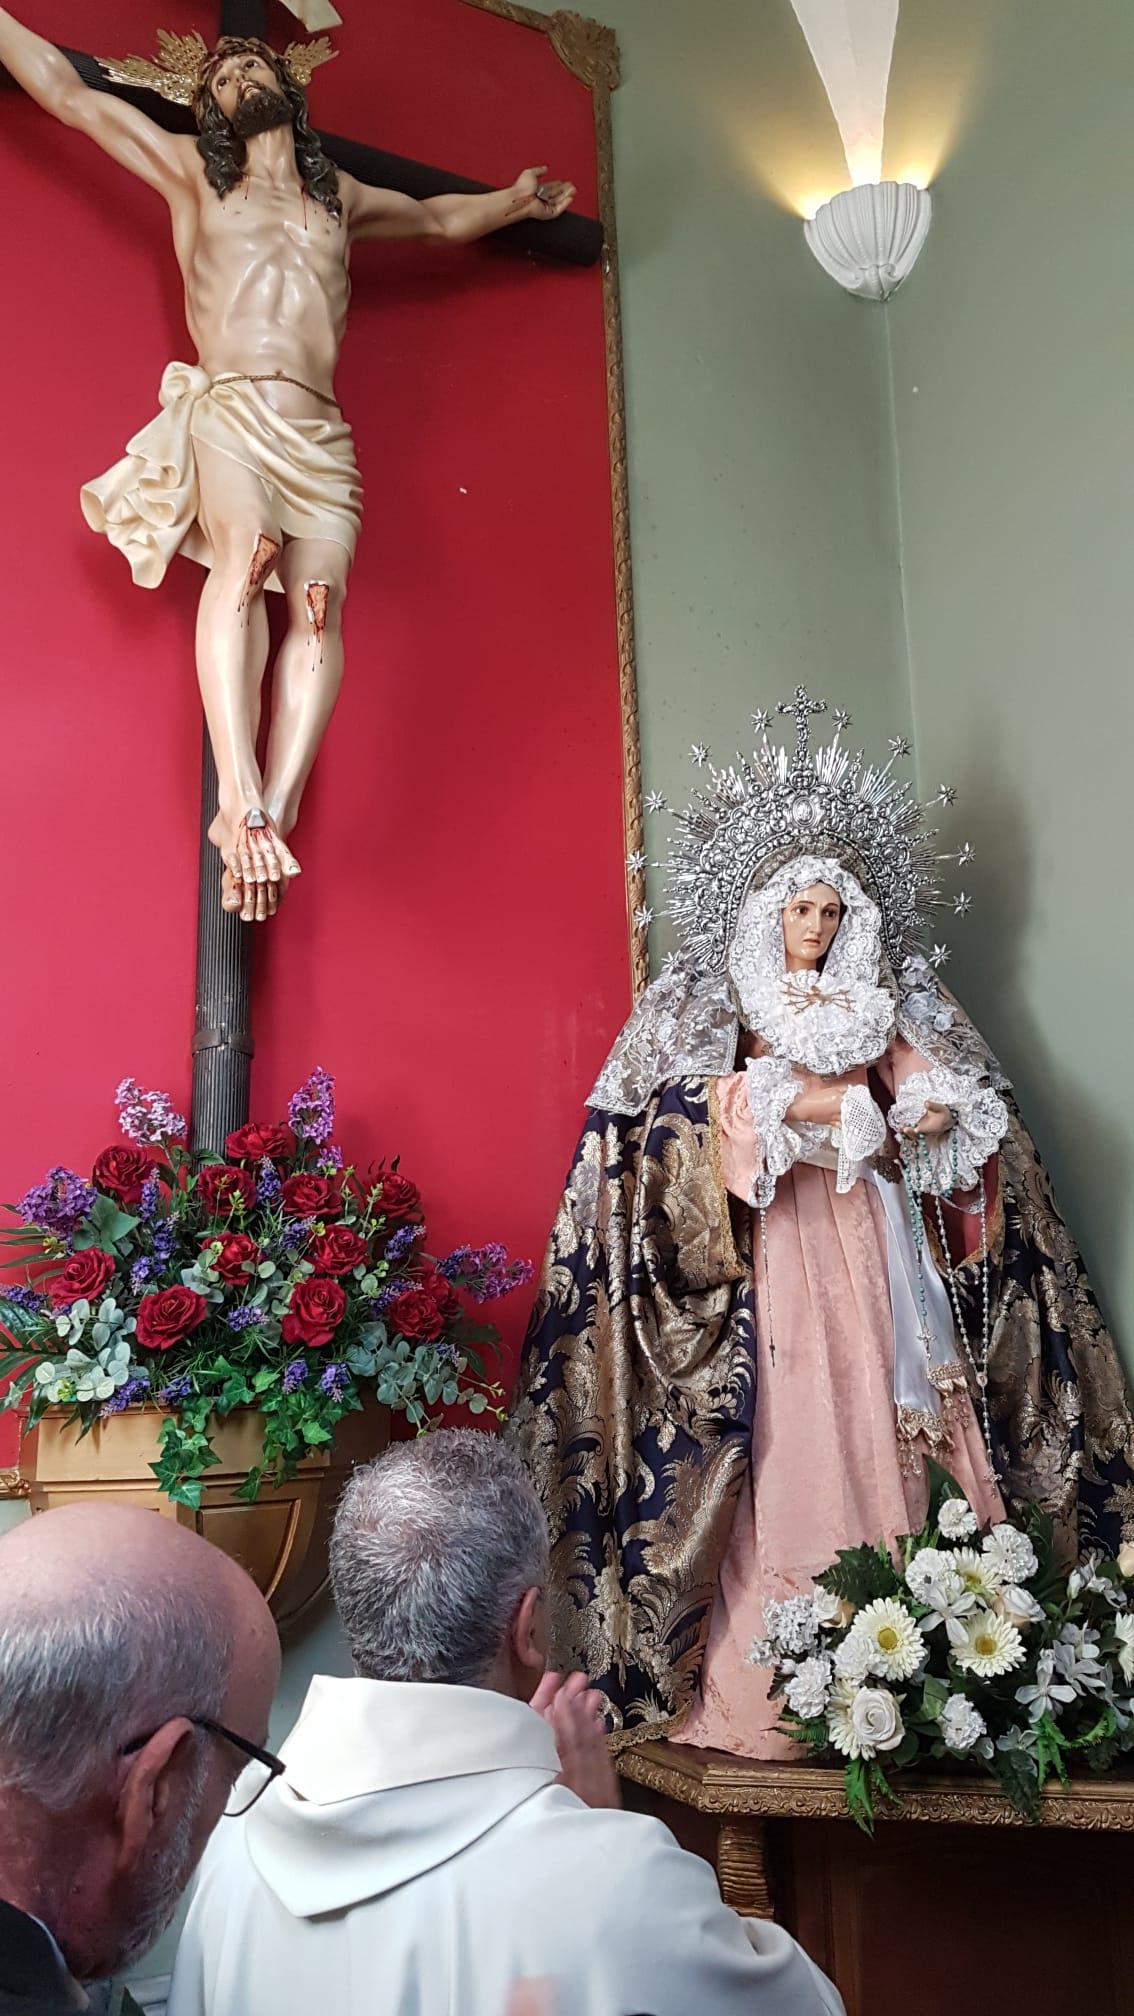 www.lignumcrucis.es-vera-cruz-santa-coloma-del-gramanet-titulares-1